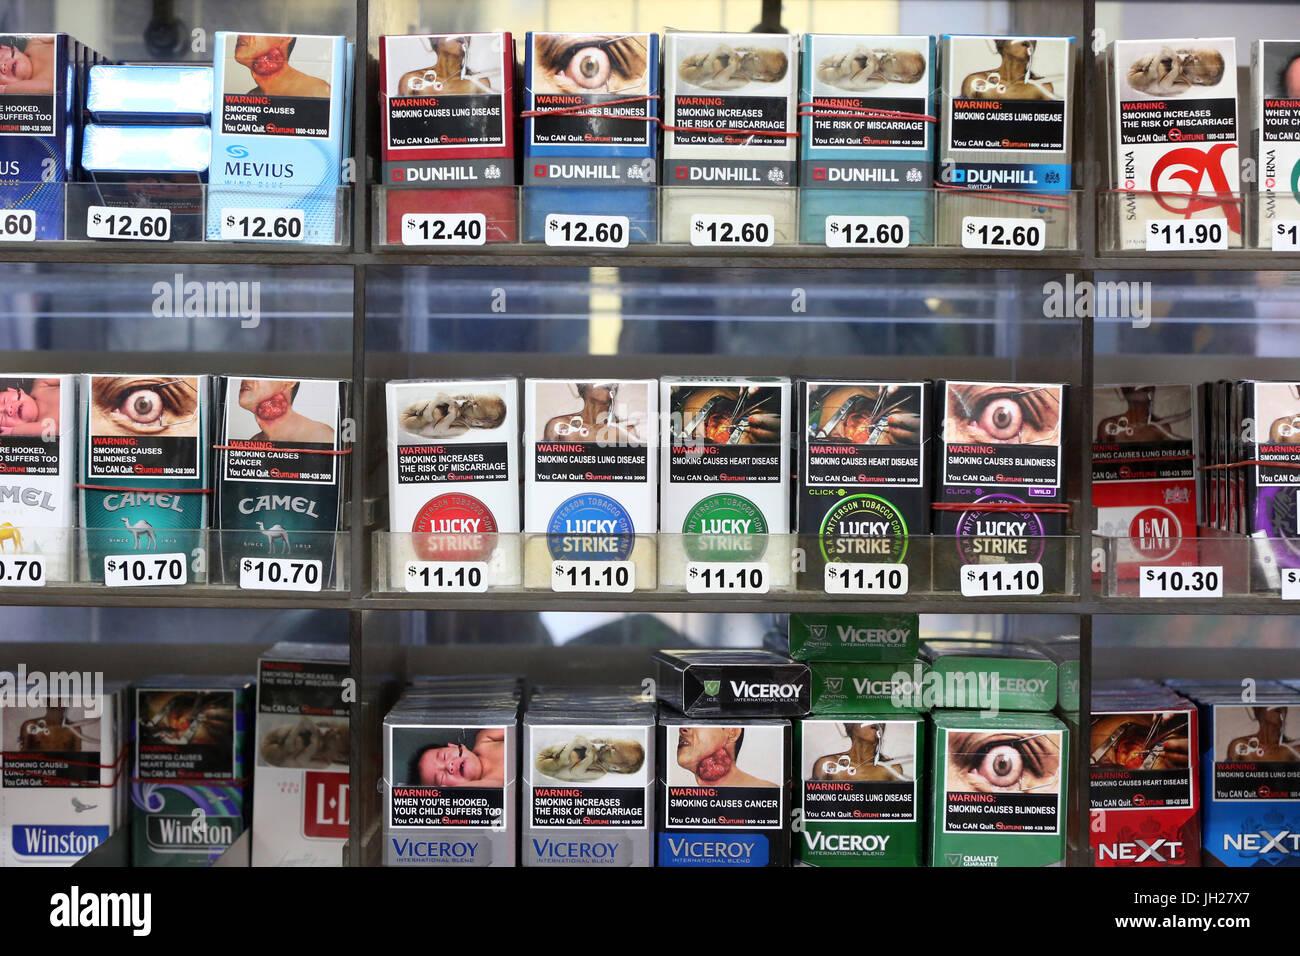 0fe83cc9cc Cigarettes for sale. Singapore Stock Photo: 148182223 - Alamy